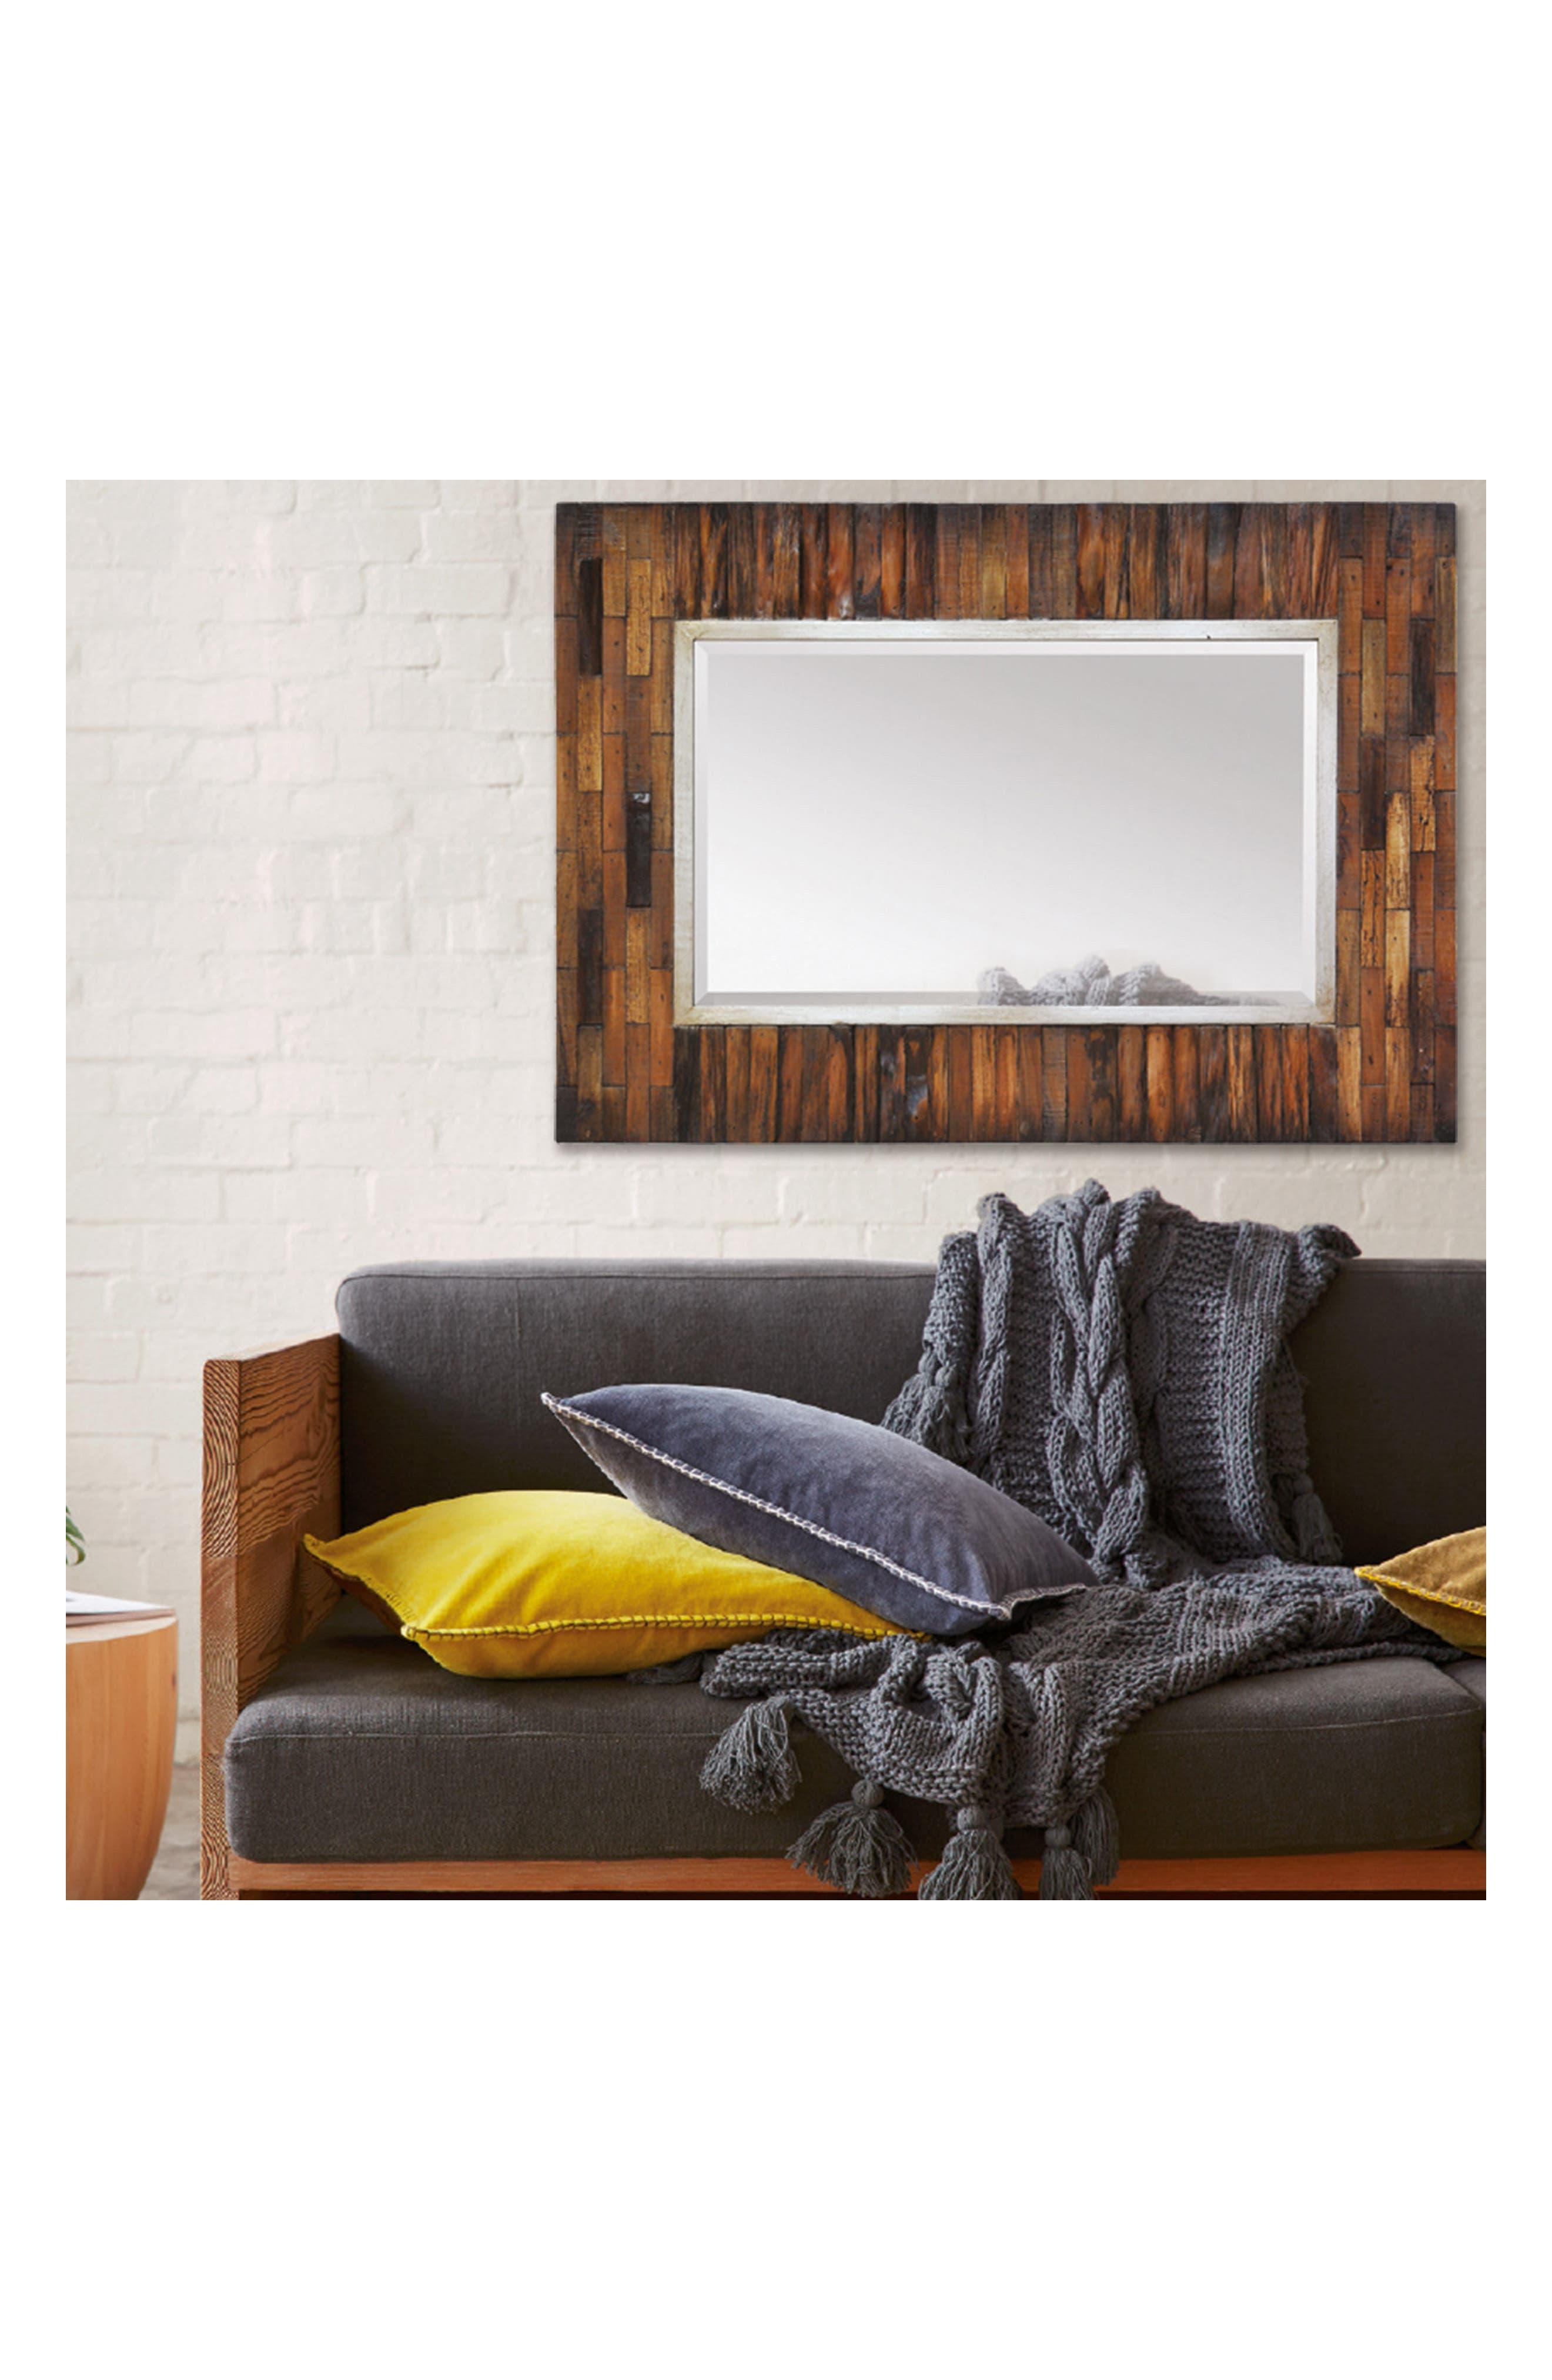 Pretoria Wood Mirror,                             Alternate thumbnail 2, color,                             Natural Wood